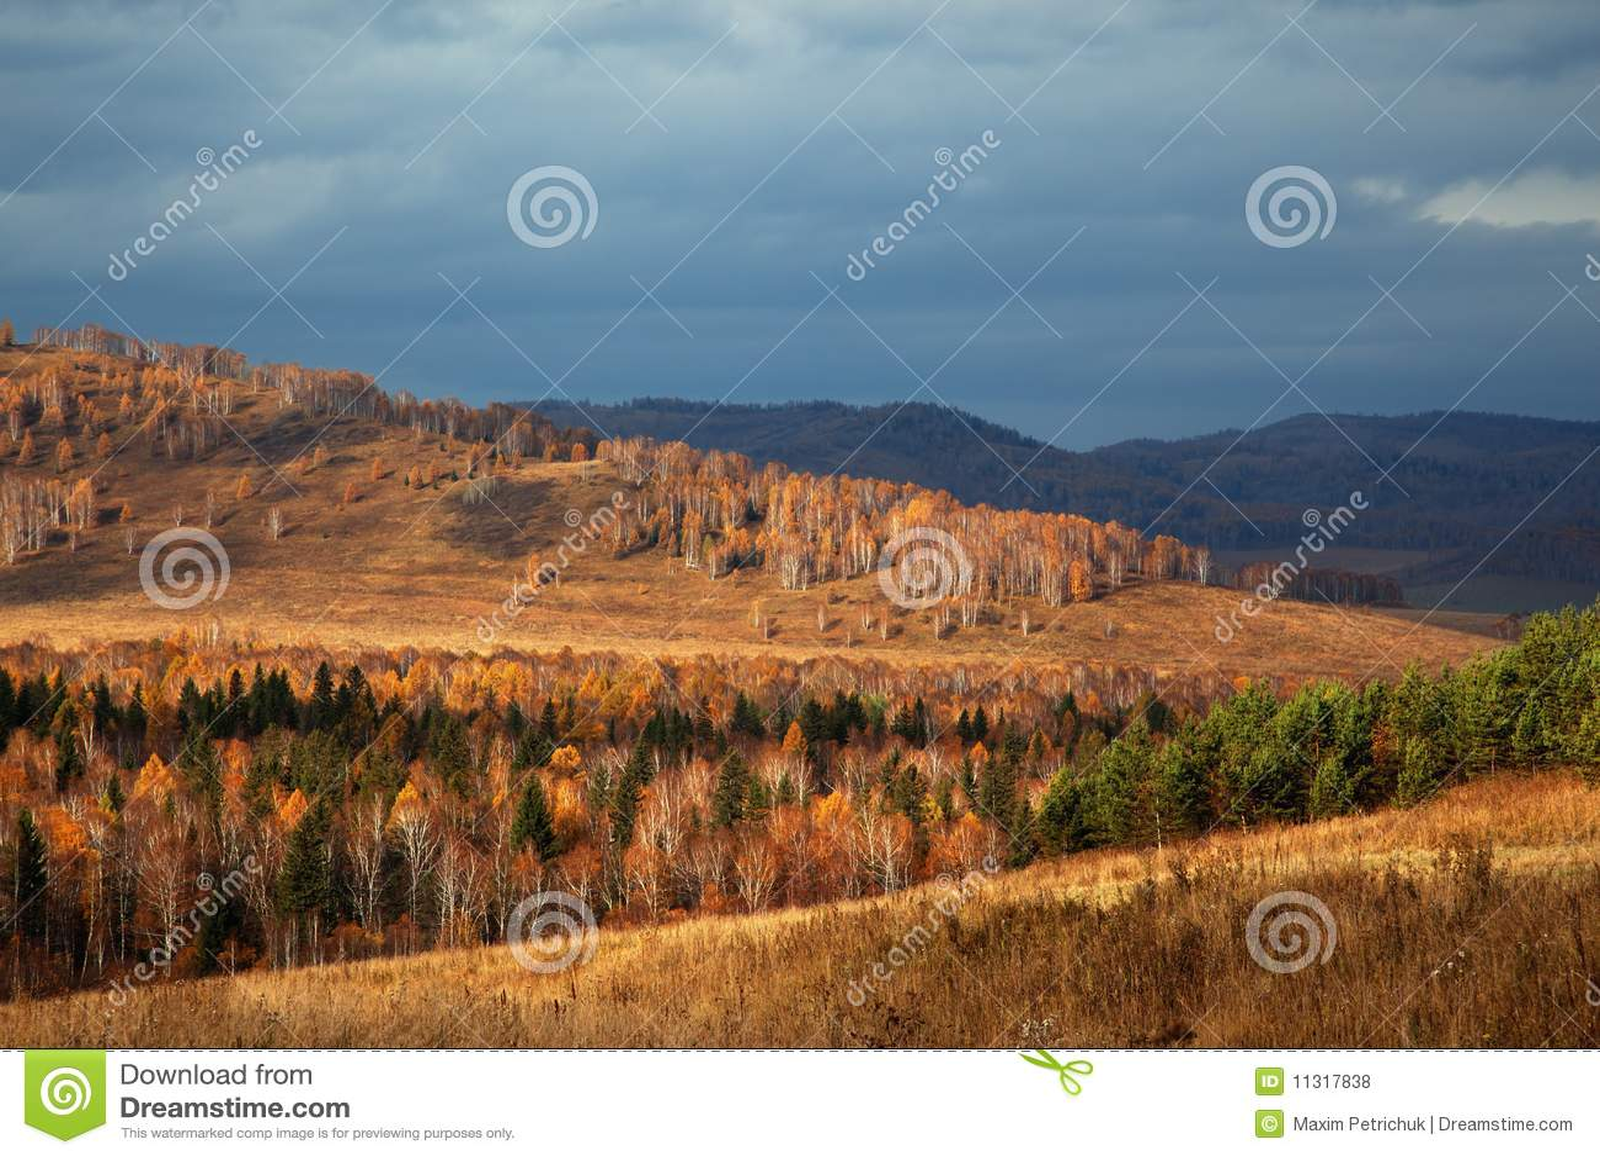 Herbst-Landschaft